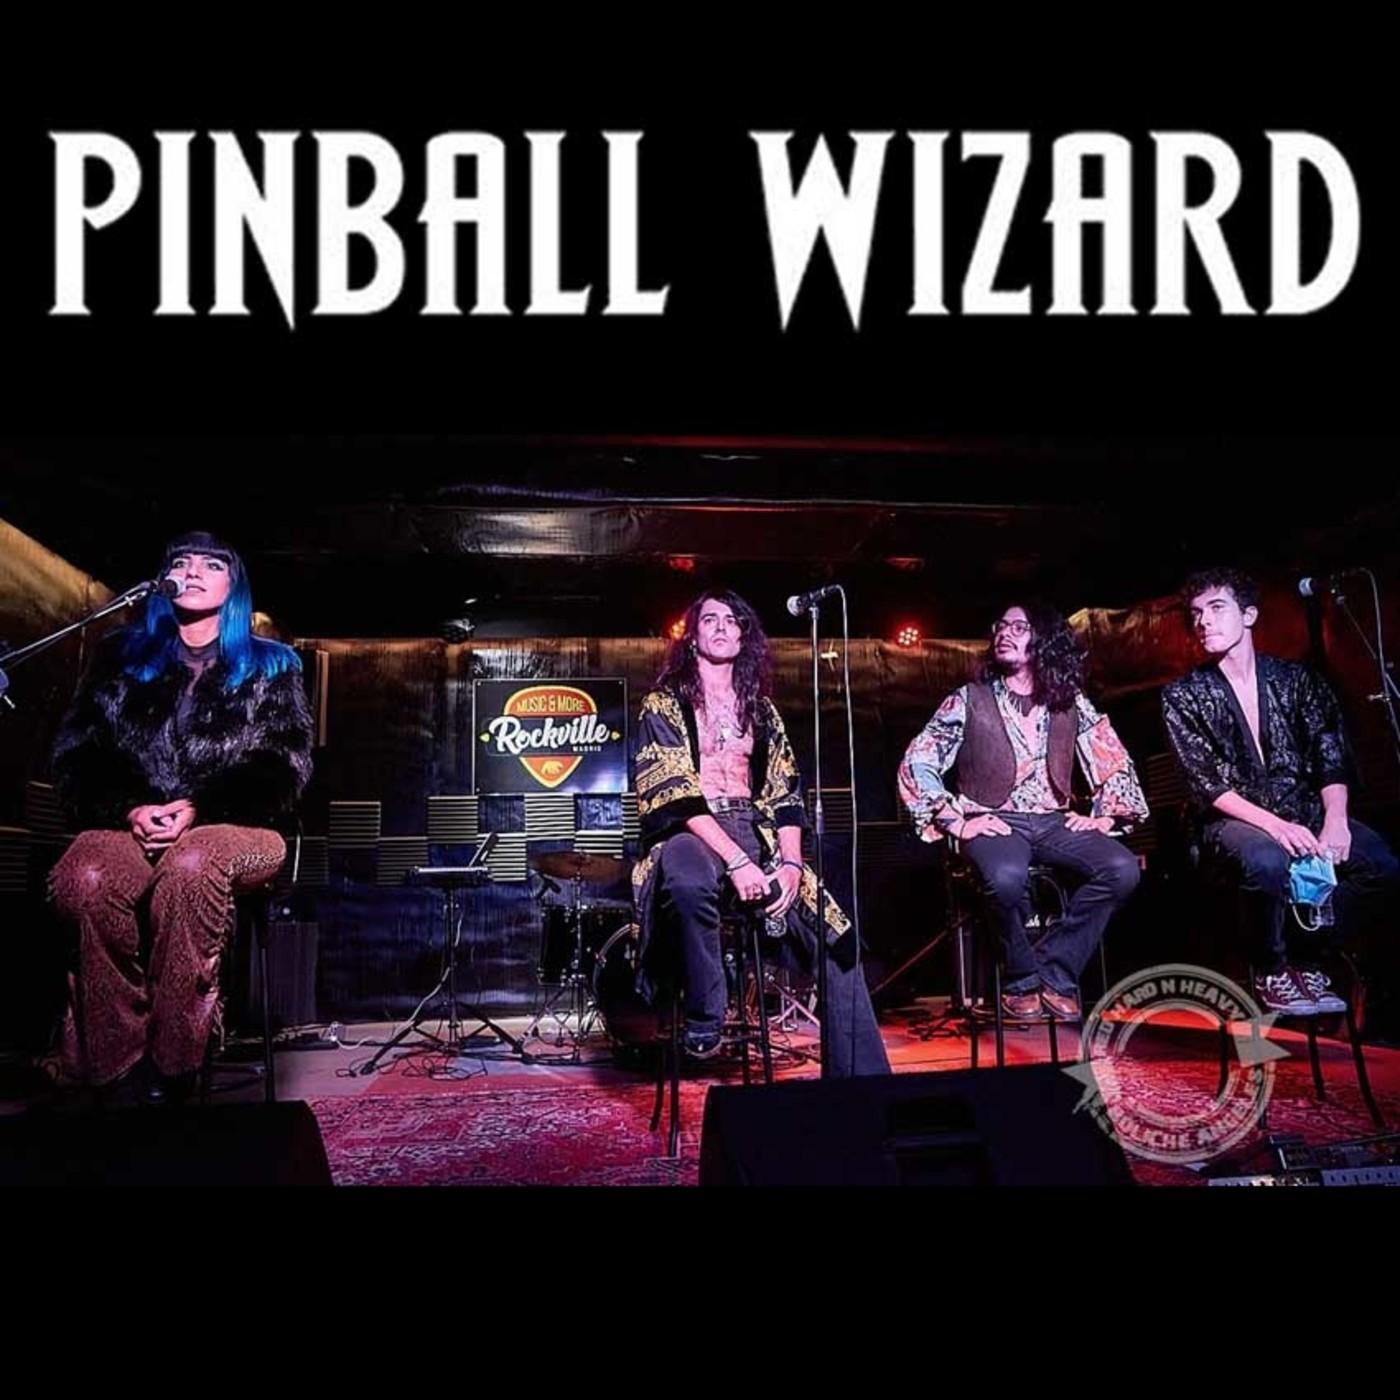 Rueda de Prensa - PINBALL WIZARD - 1 Octubre 2020 (sala Rockville)